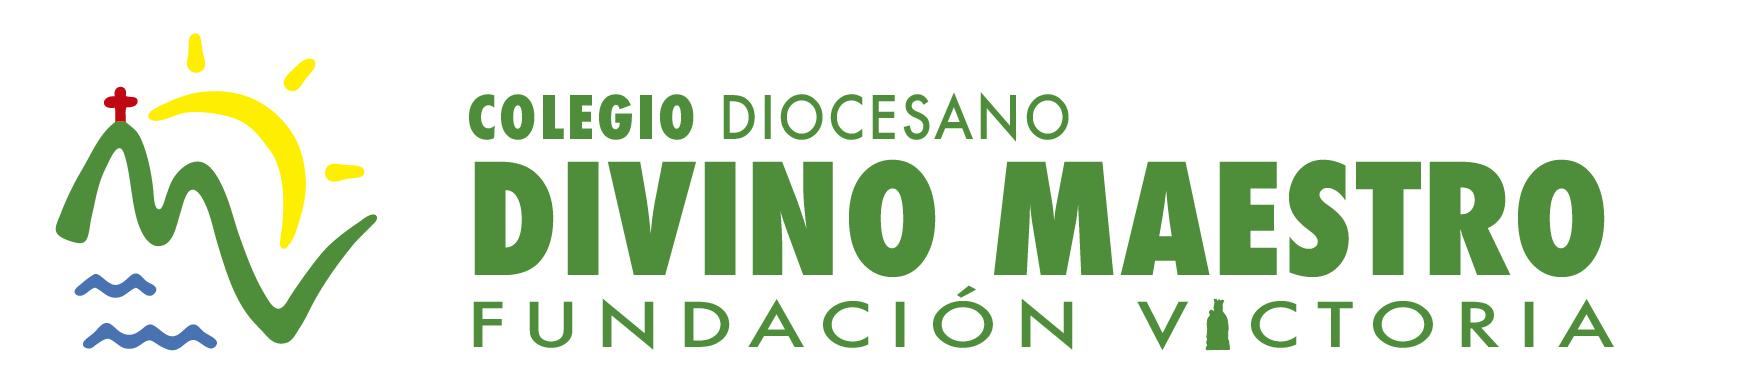 Colegio Diocesano Divino Maestro